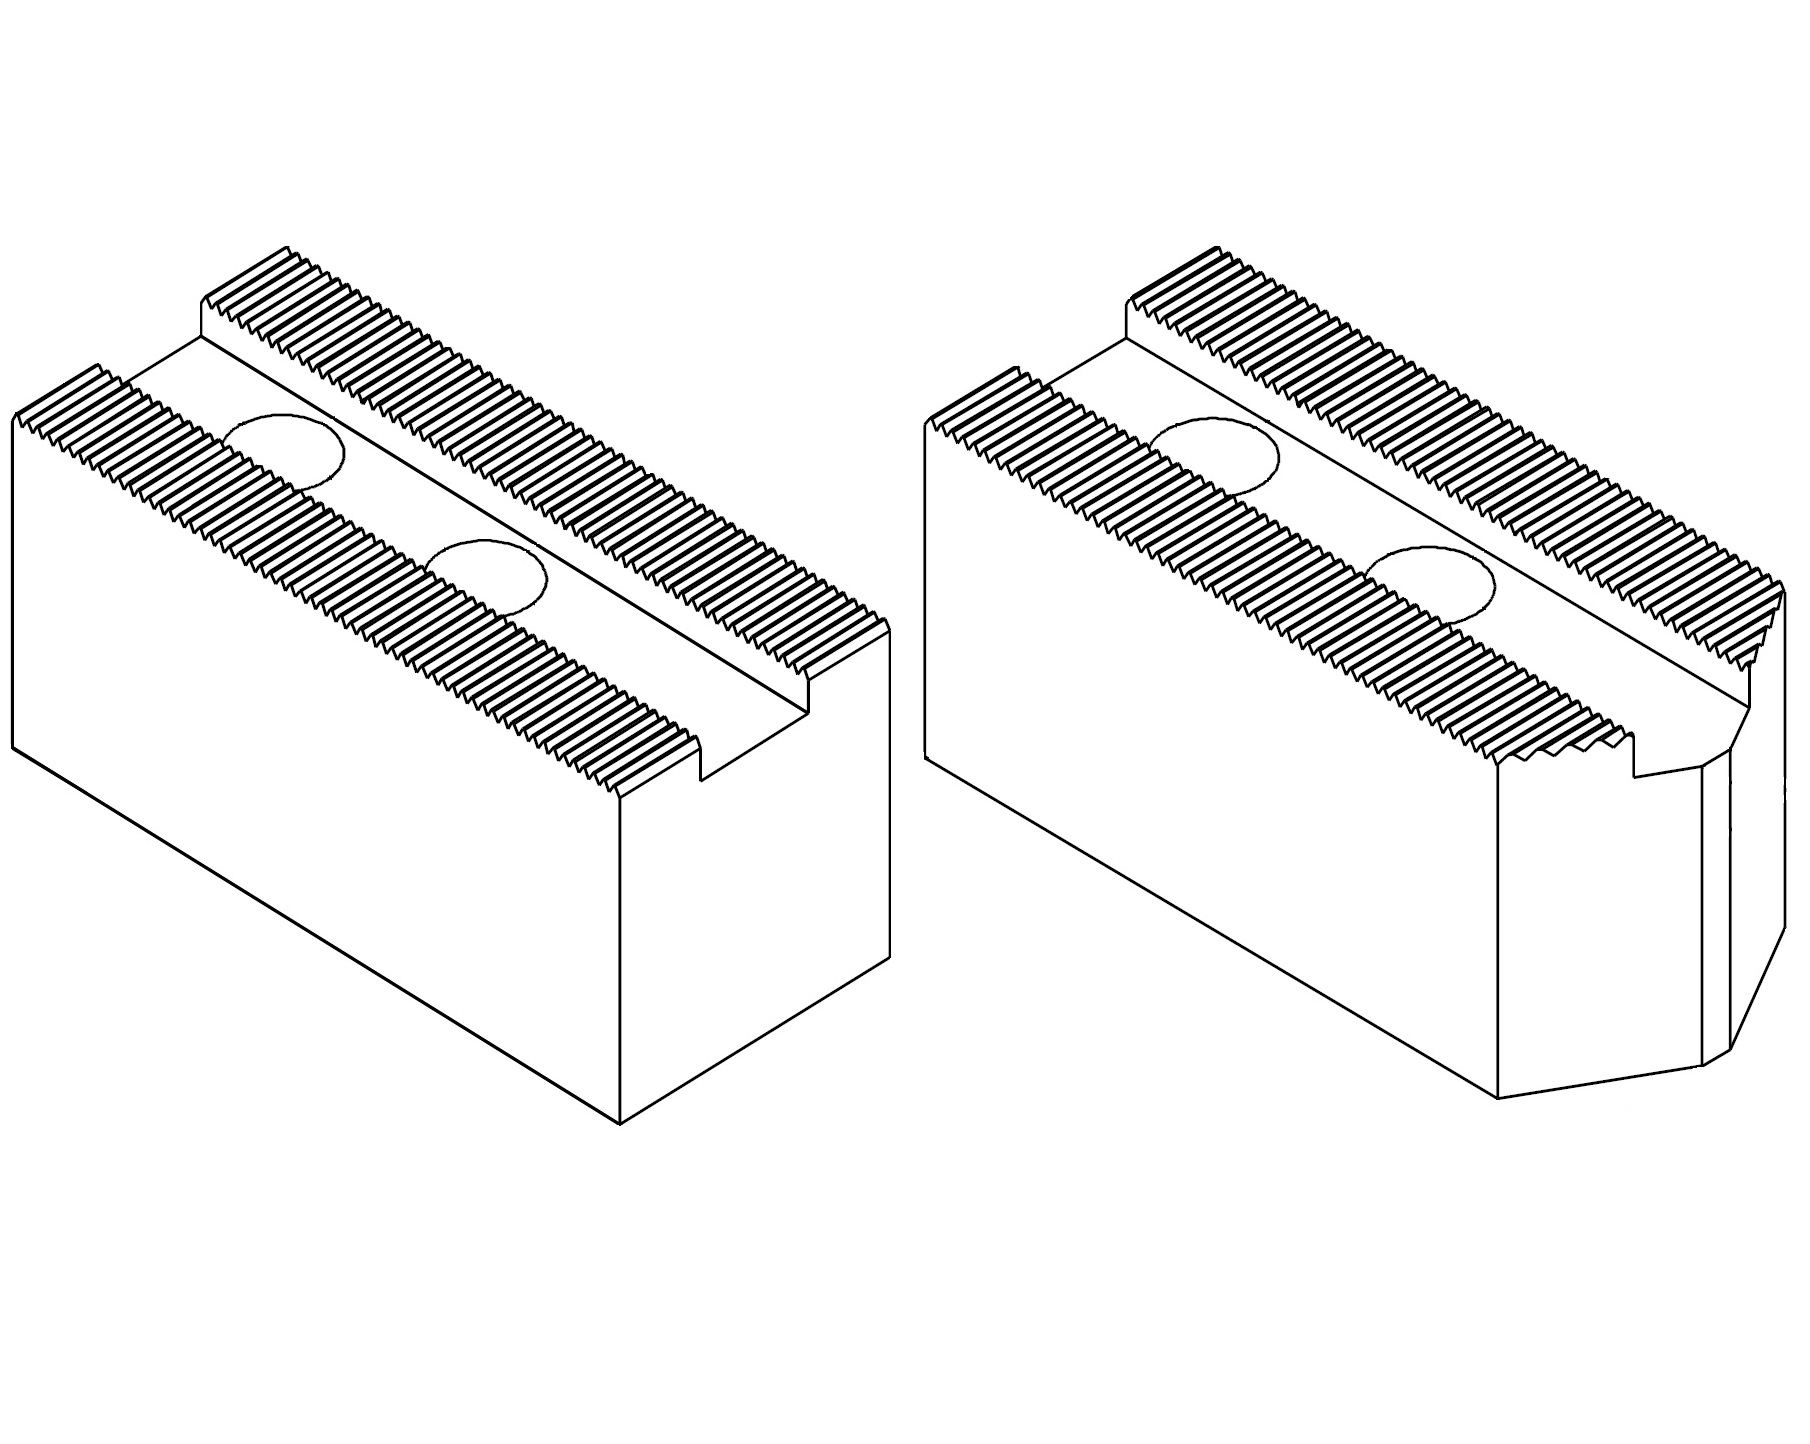 "Čelisti měkké 1/16""x90°, šířka drážky - 17 (sklíčidla pr. 160 - 315 mm)"